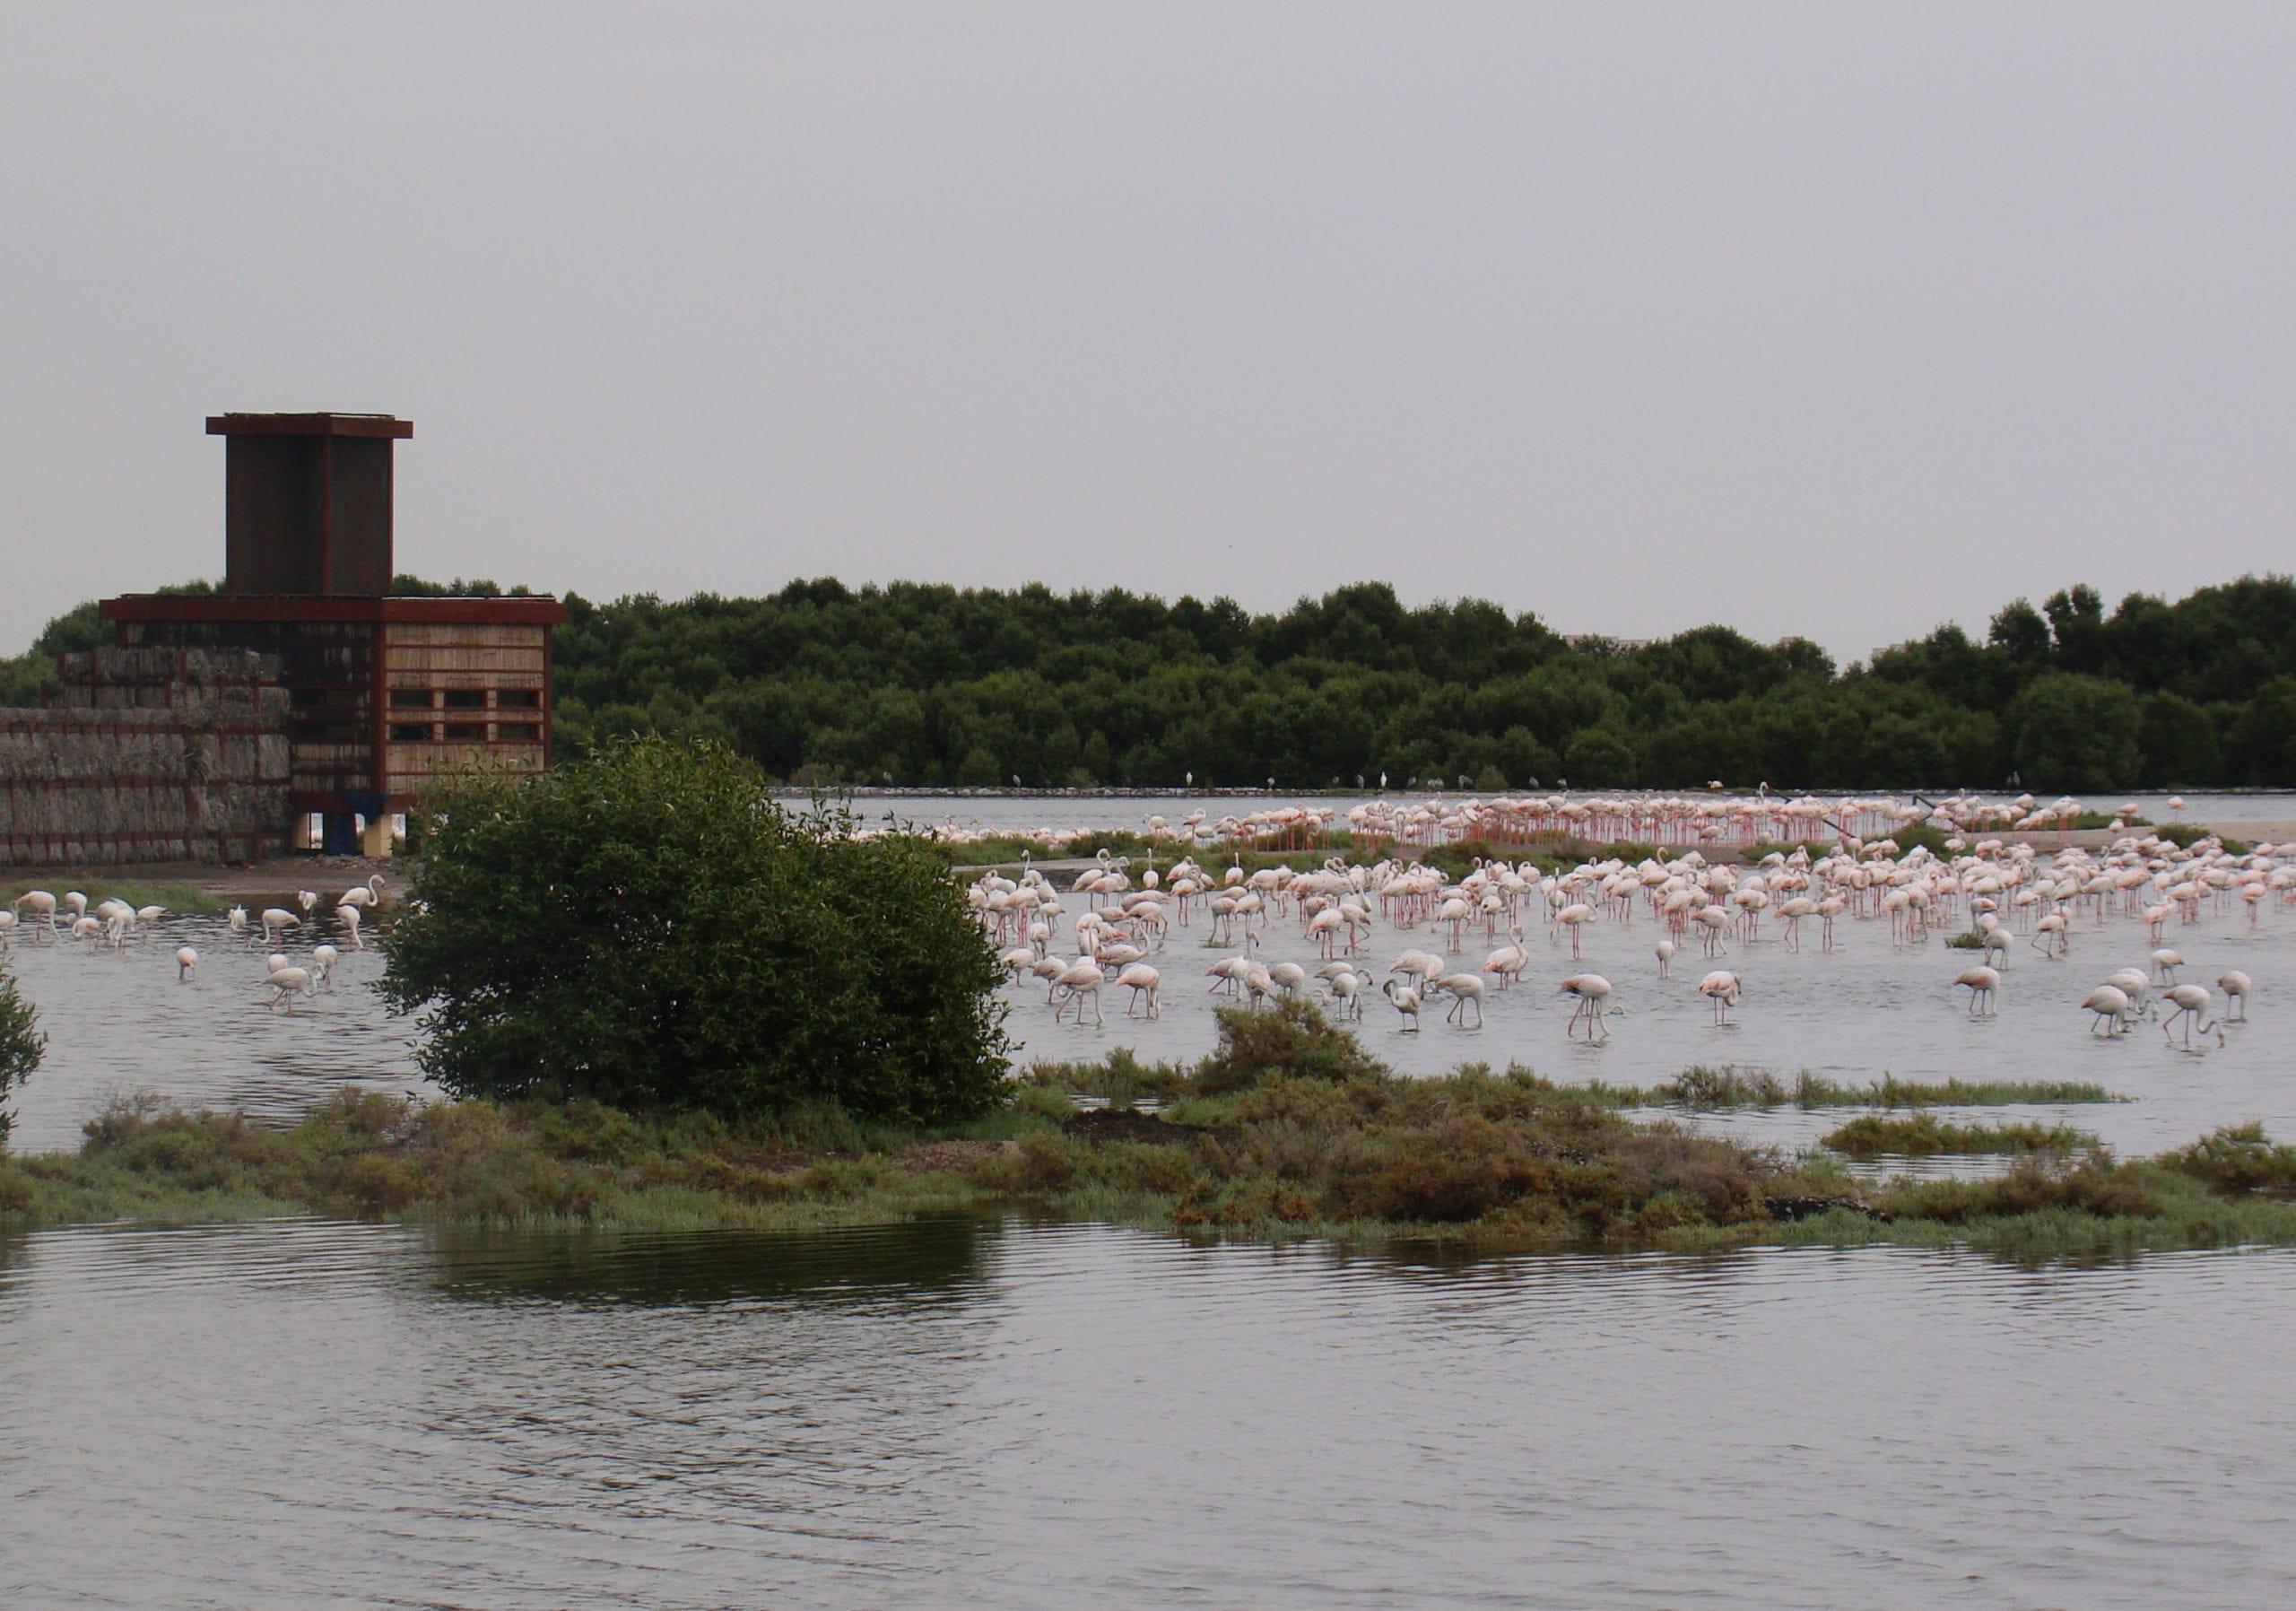 2. Flamingo hide scaled